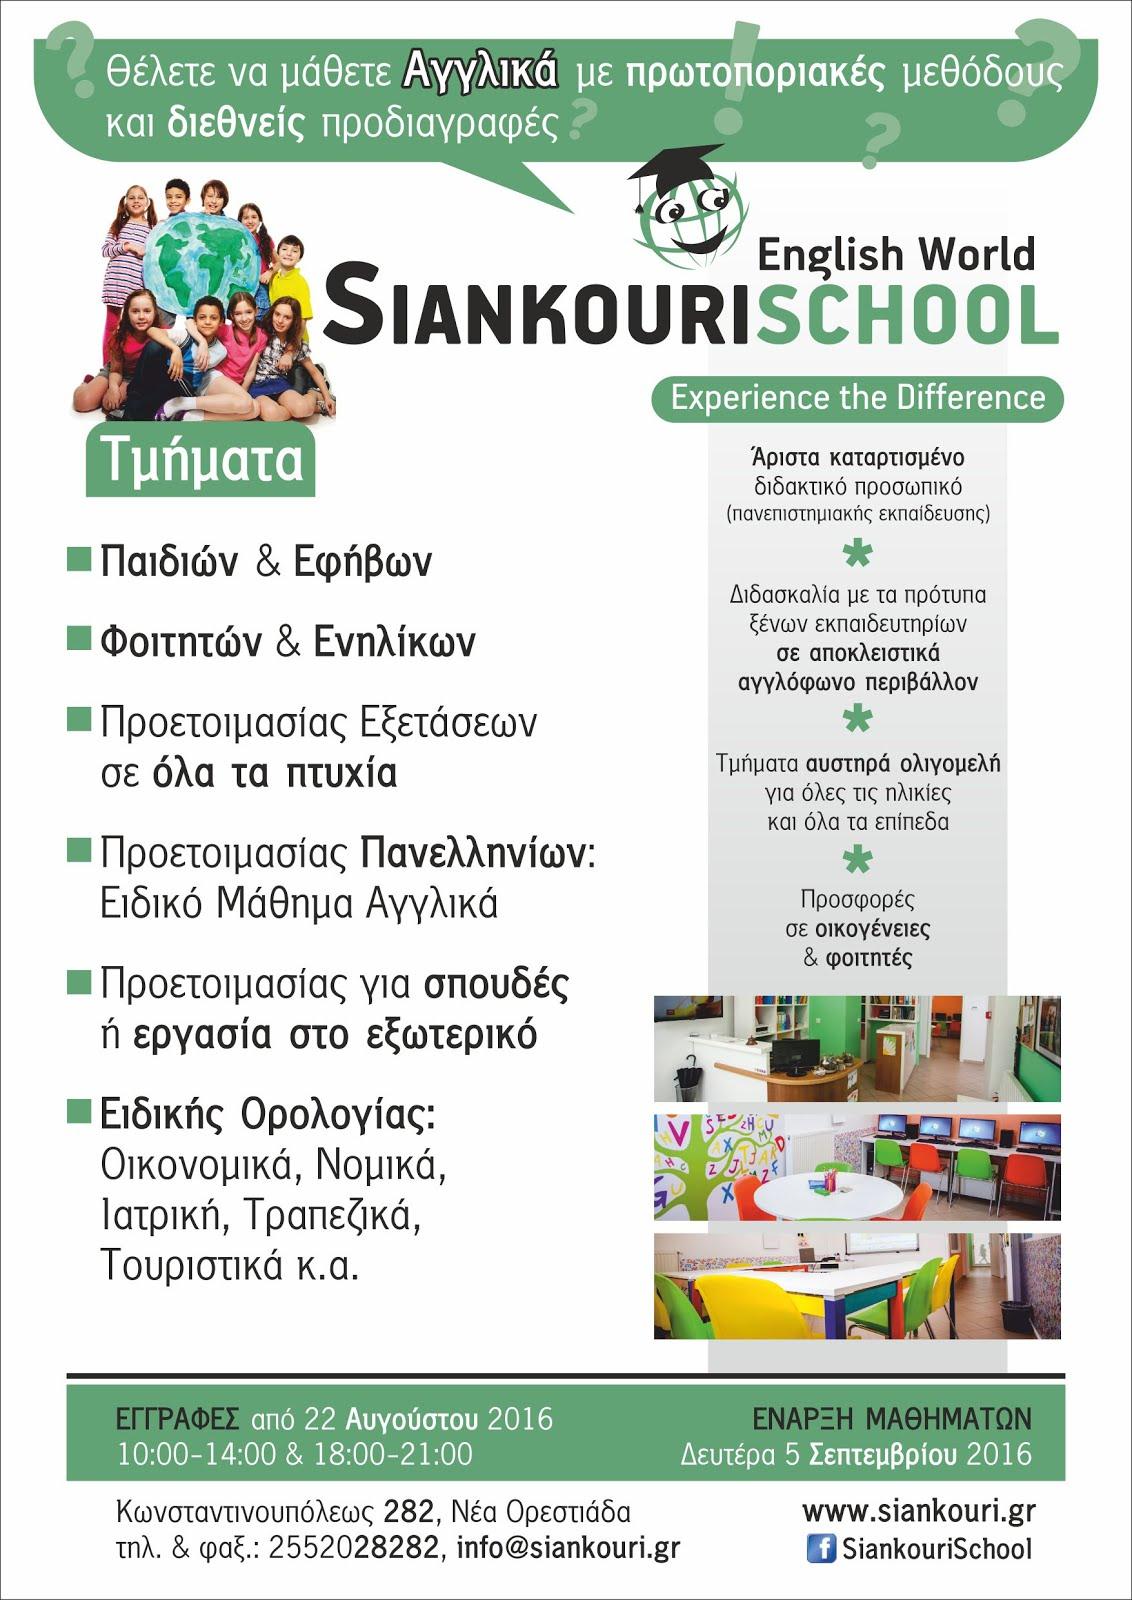 Siankouri School